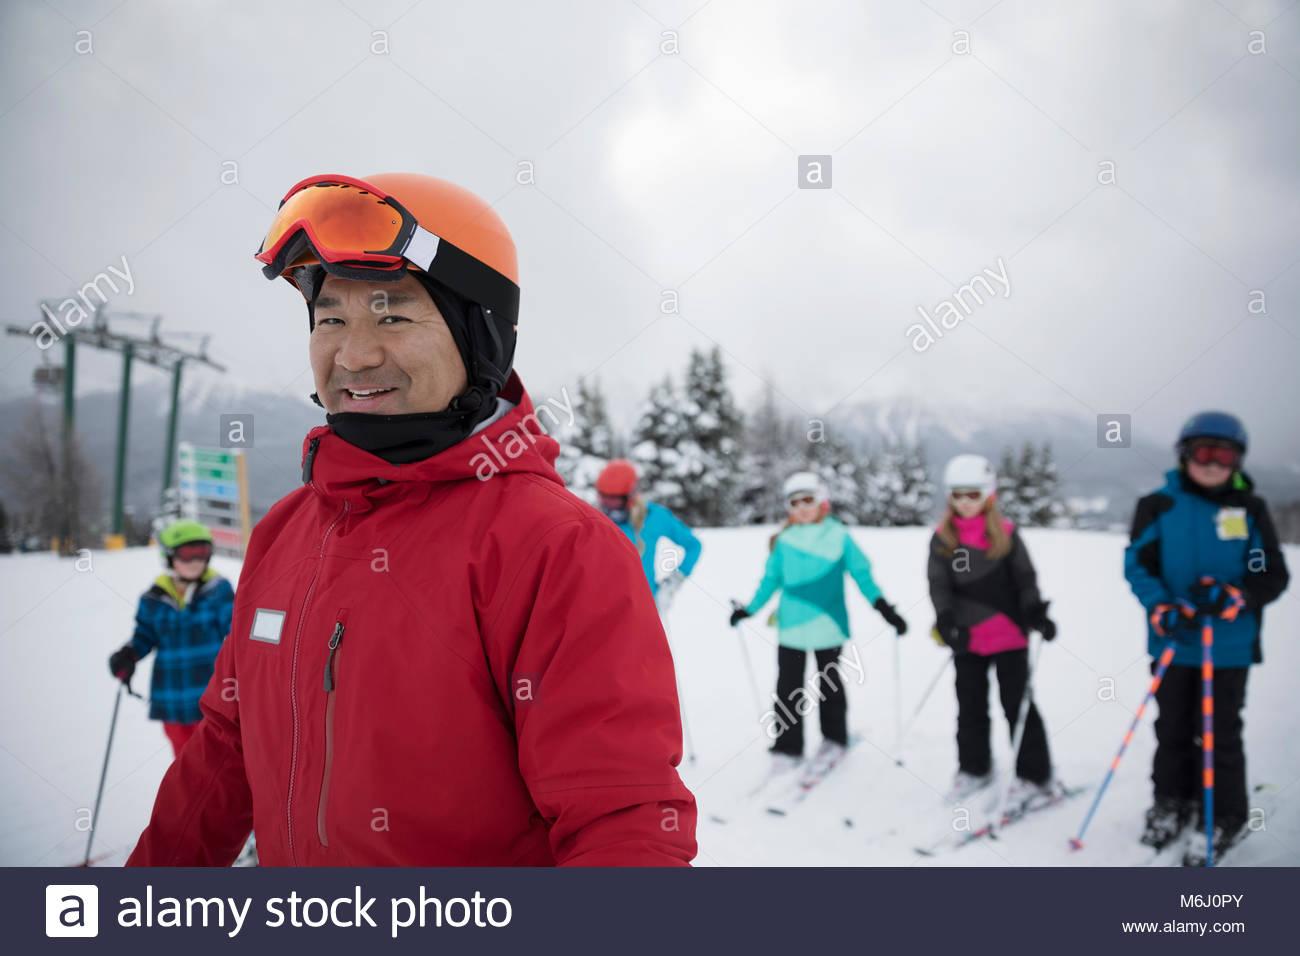 Portrait smiling, confident ski instructor teaching kids on snowy mountain - Stock Image